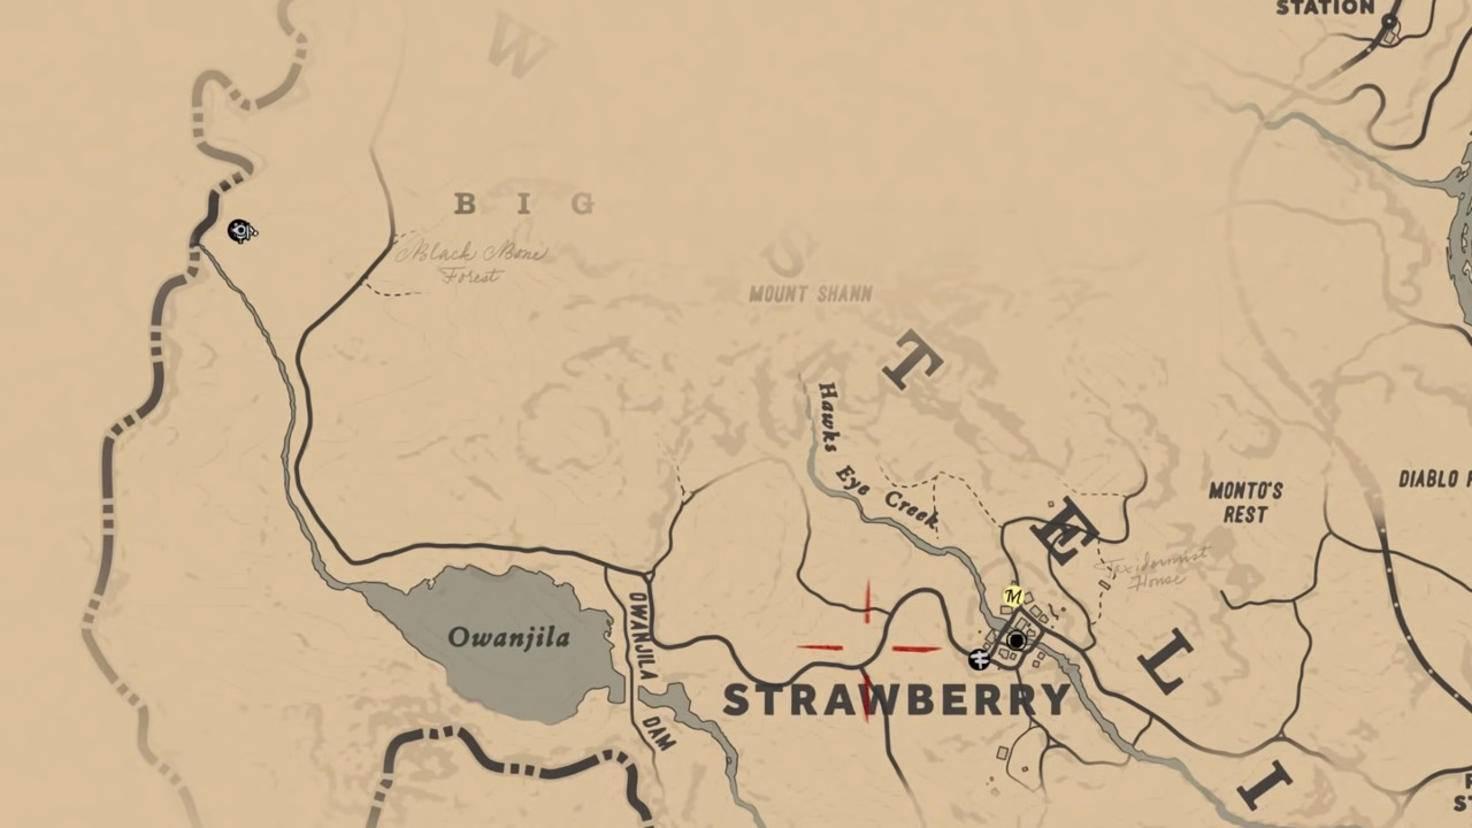 Standort des Trappers bei Strawberry.